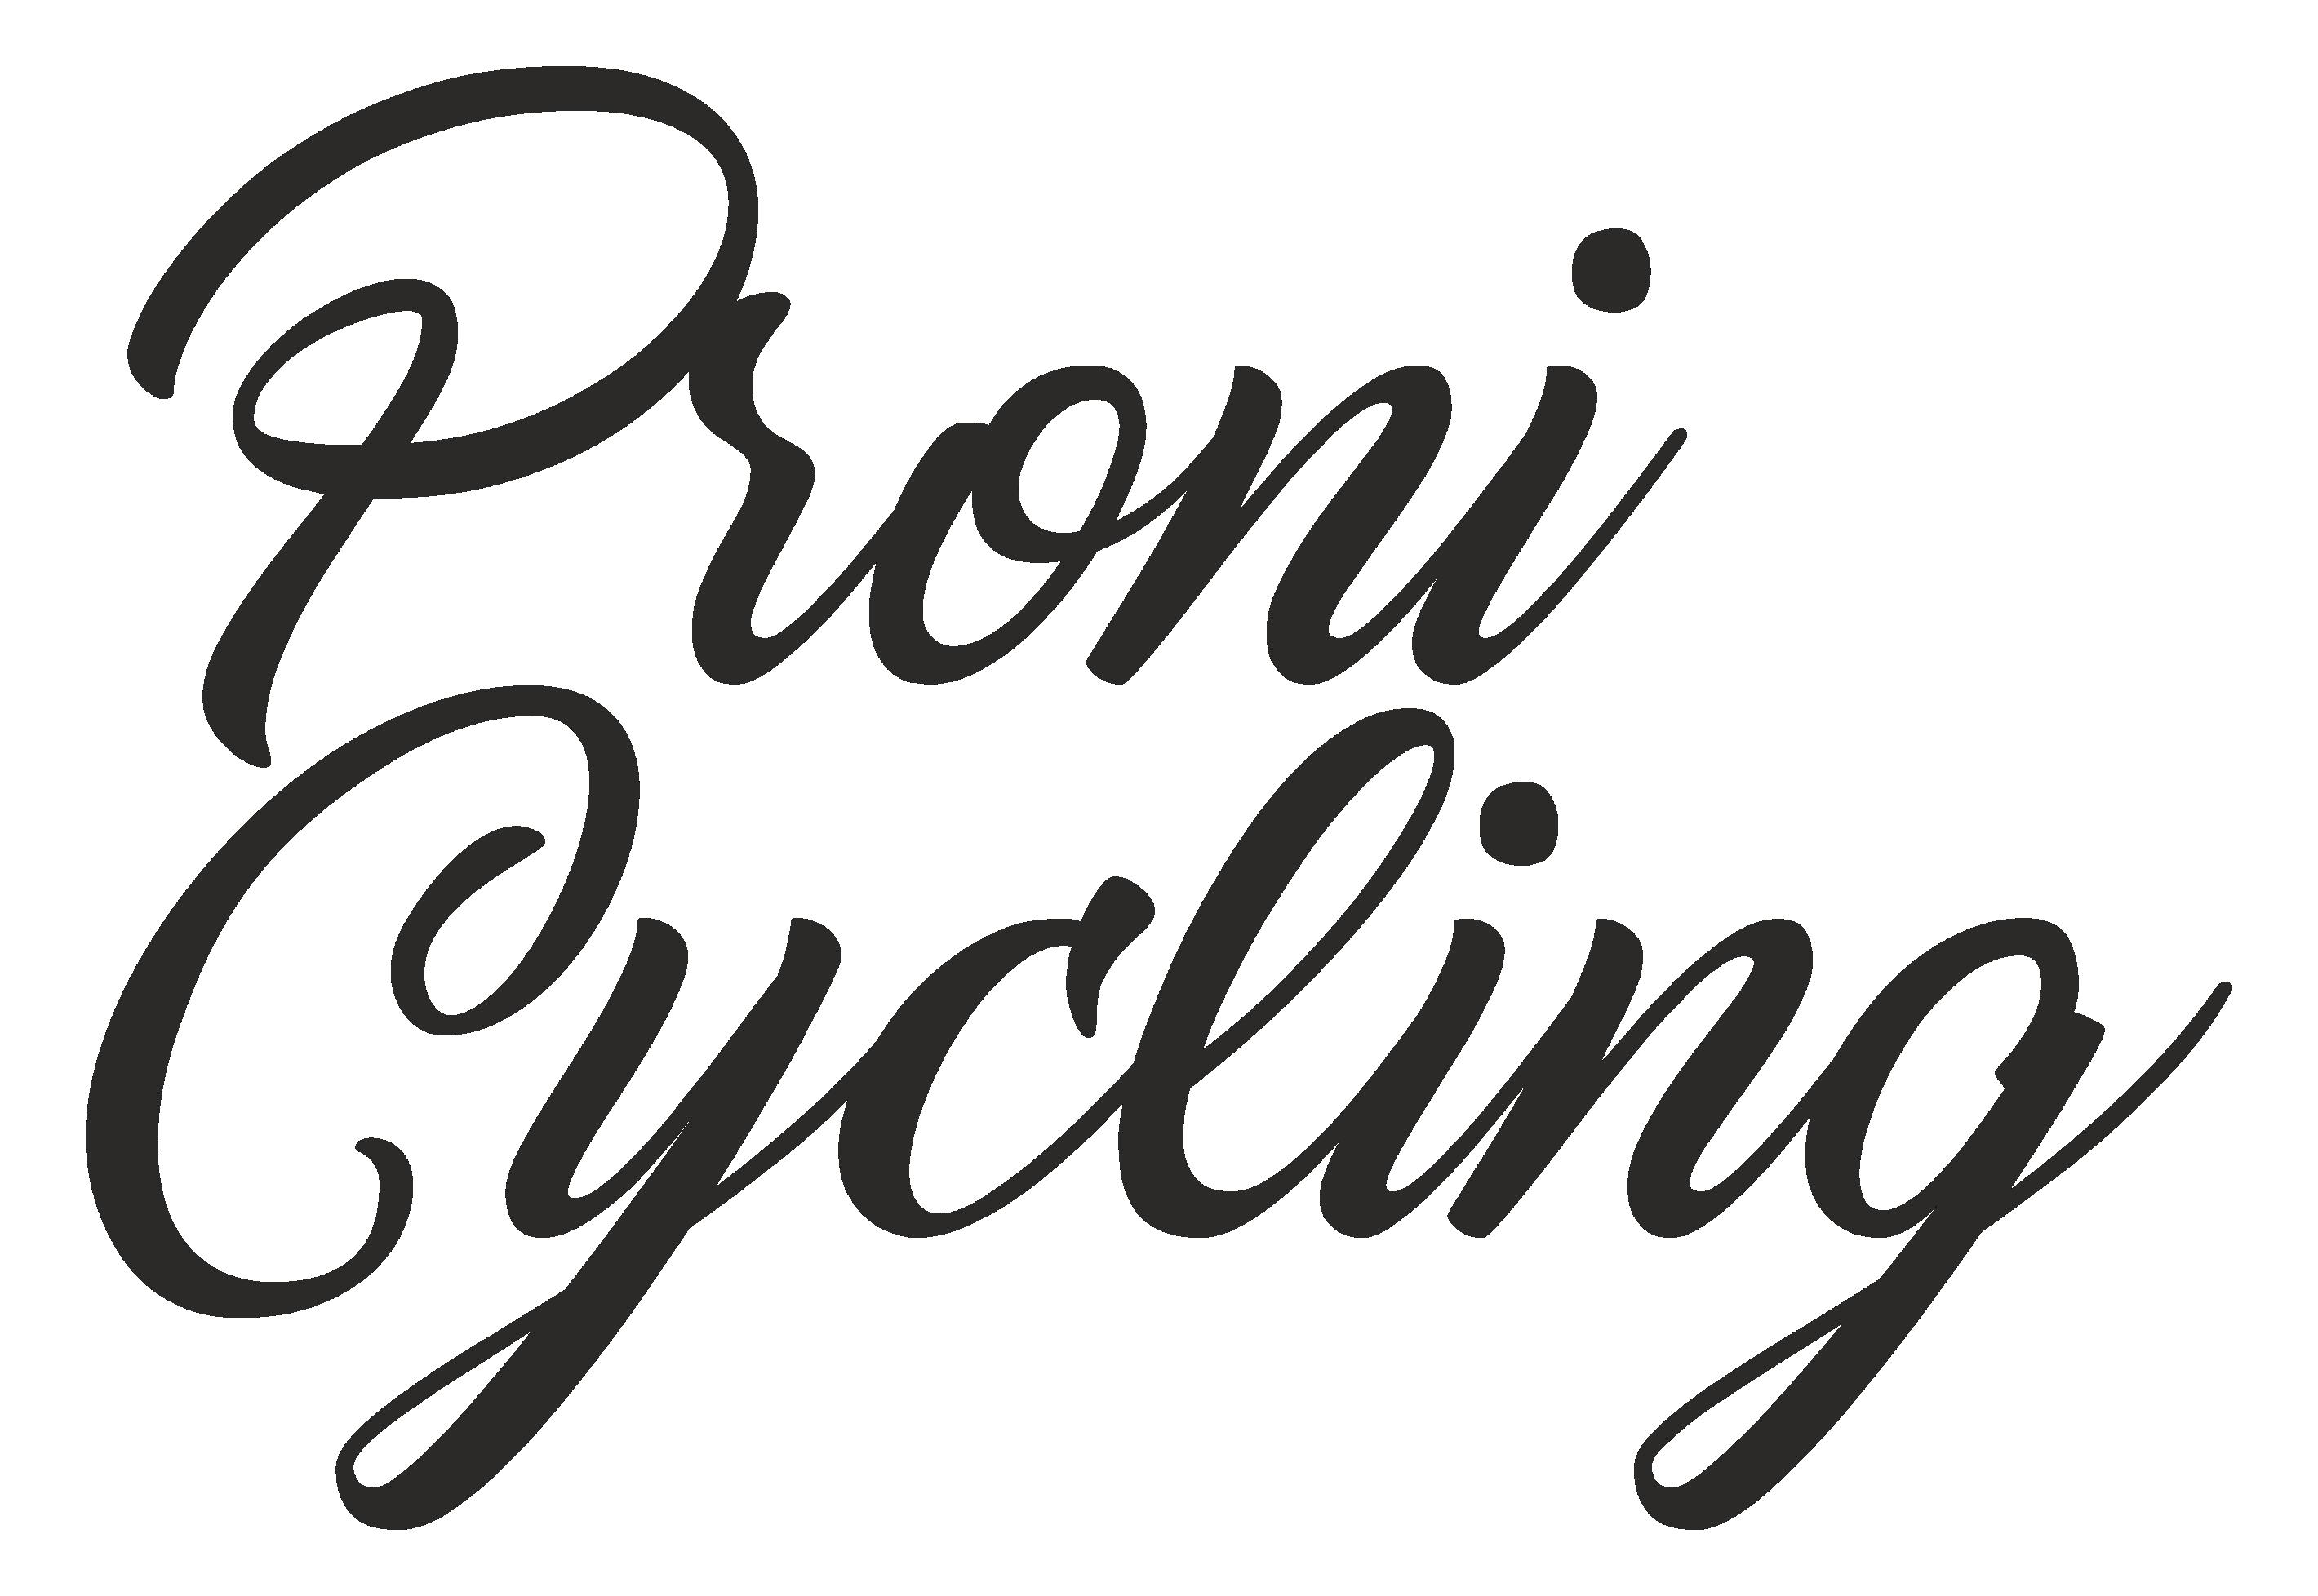 ProniCycling